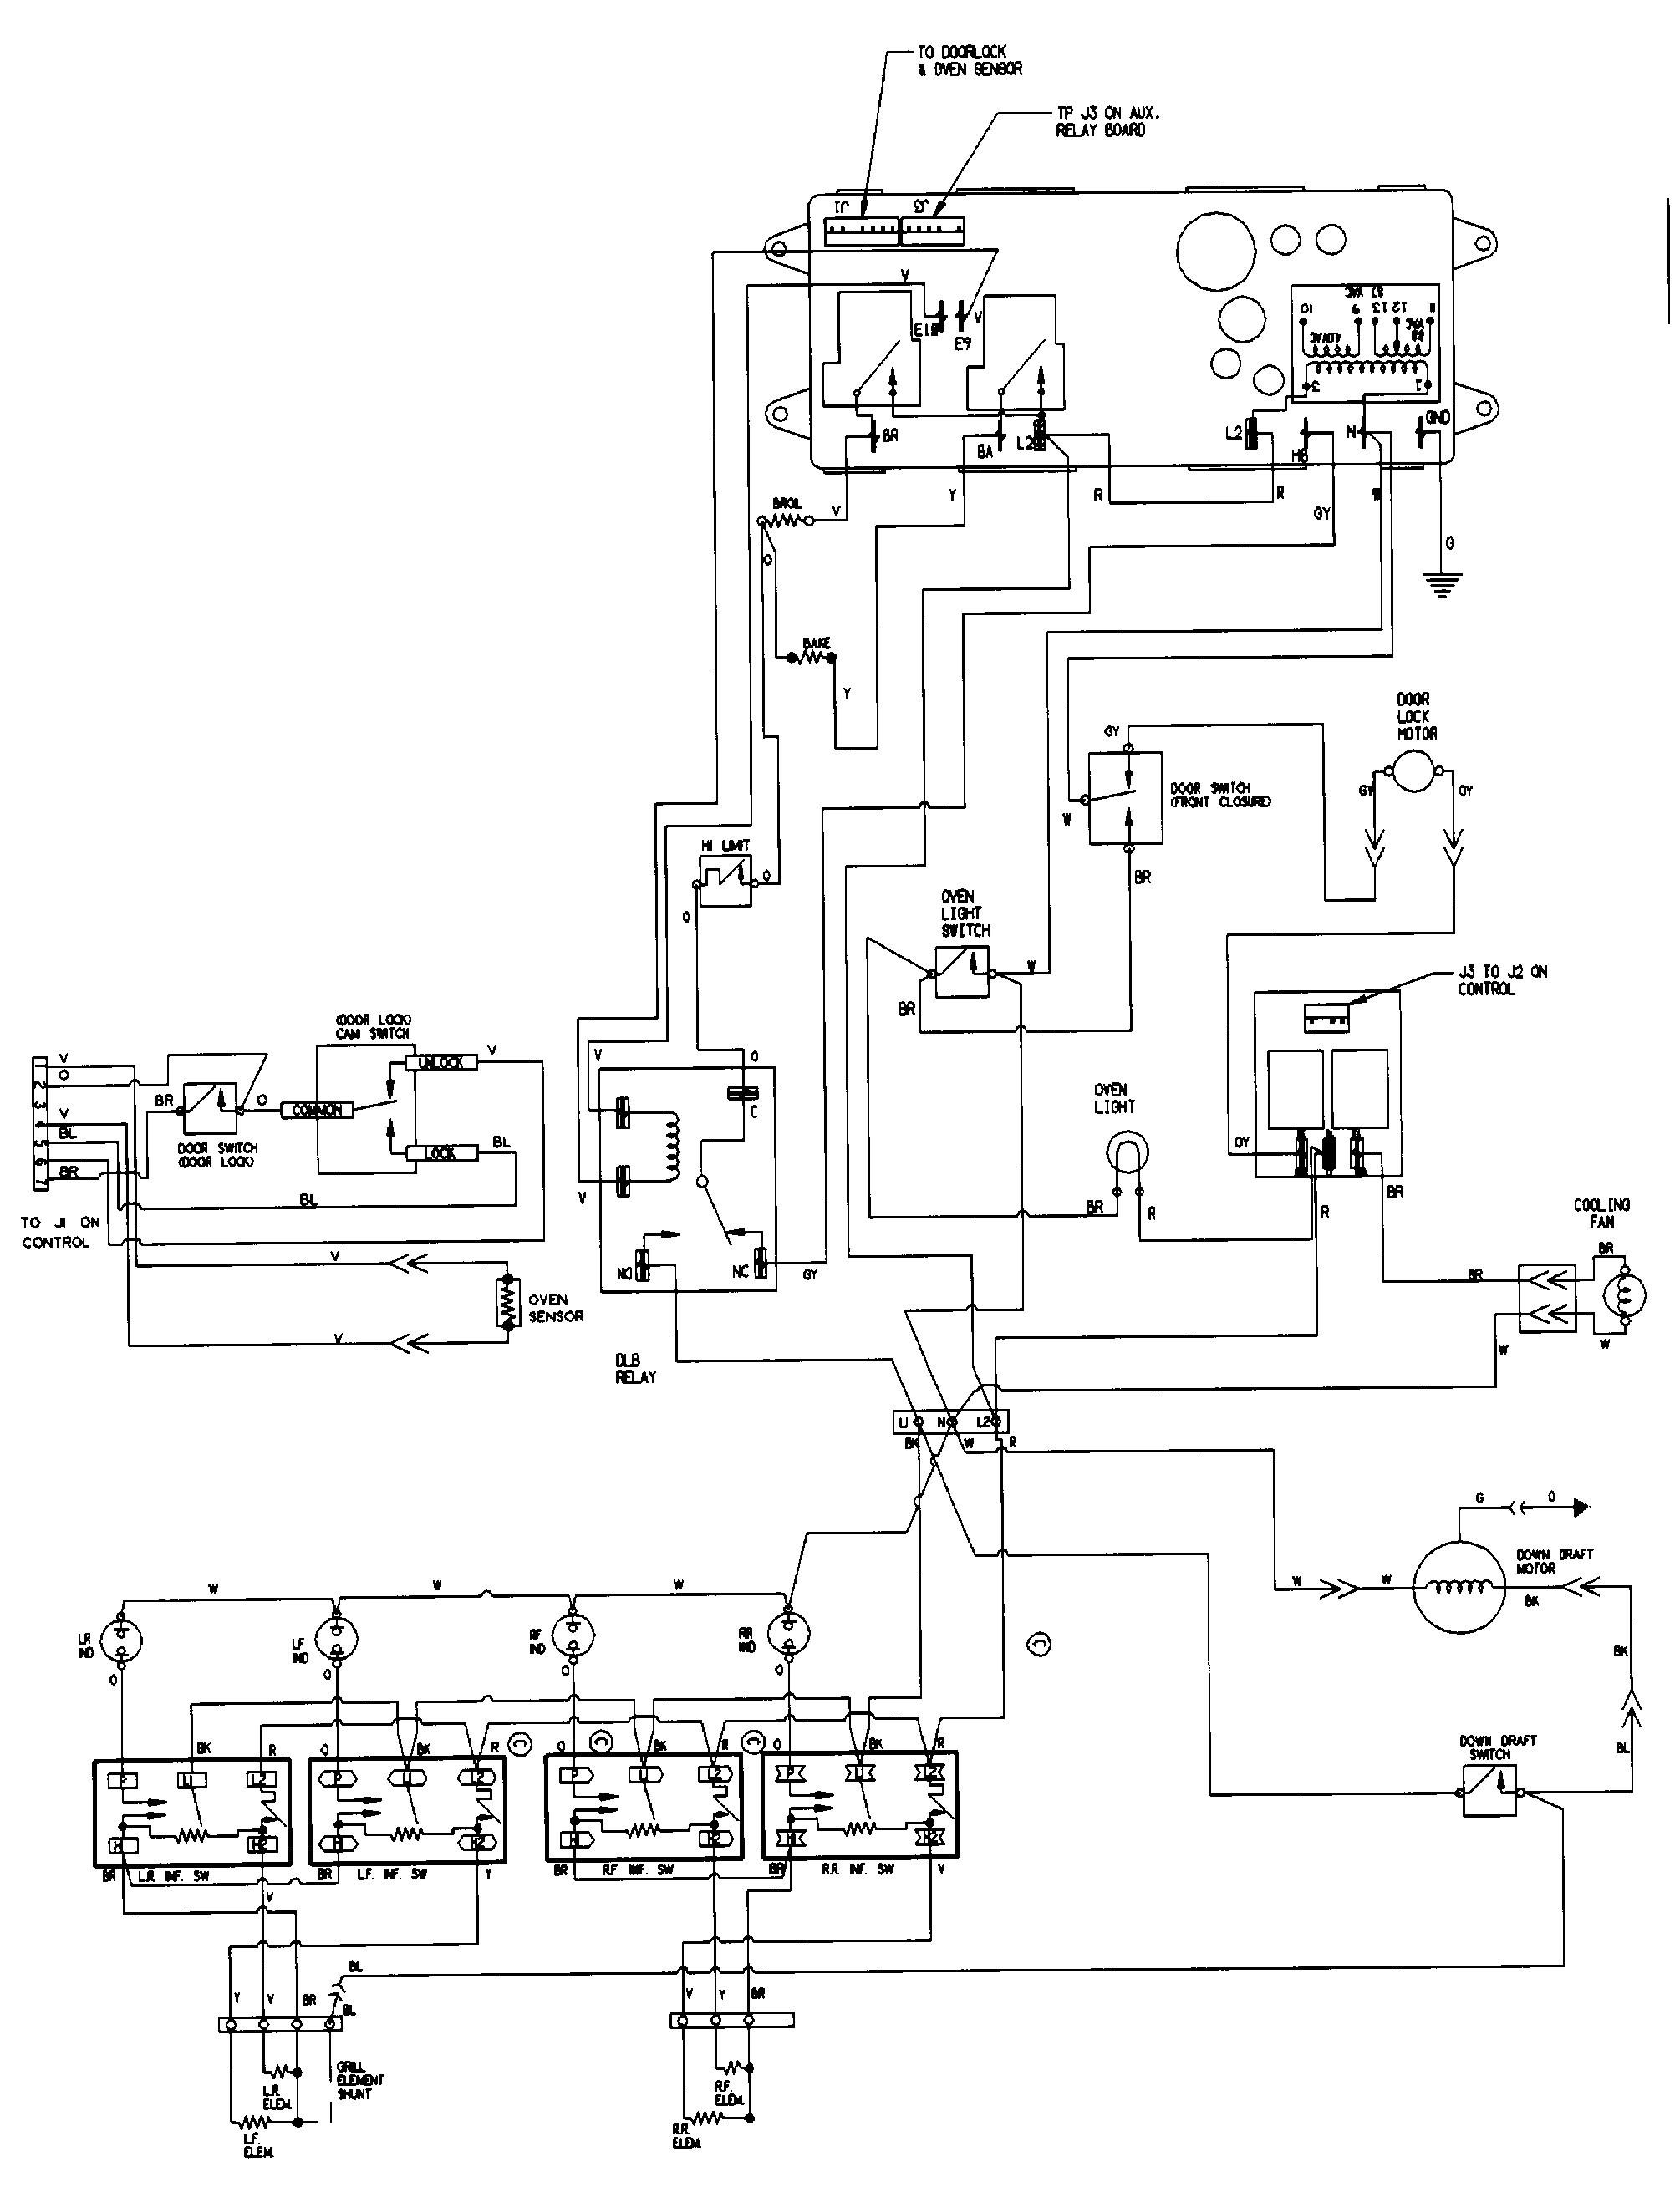 Grand Am Wiring Diagram